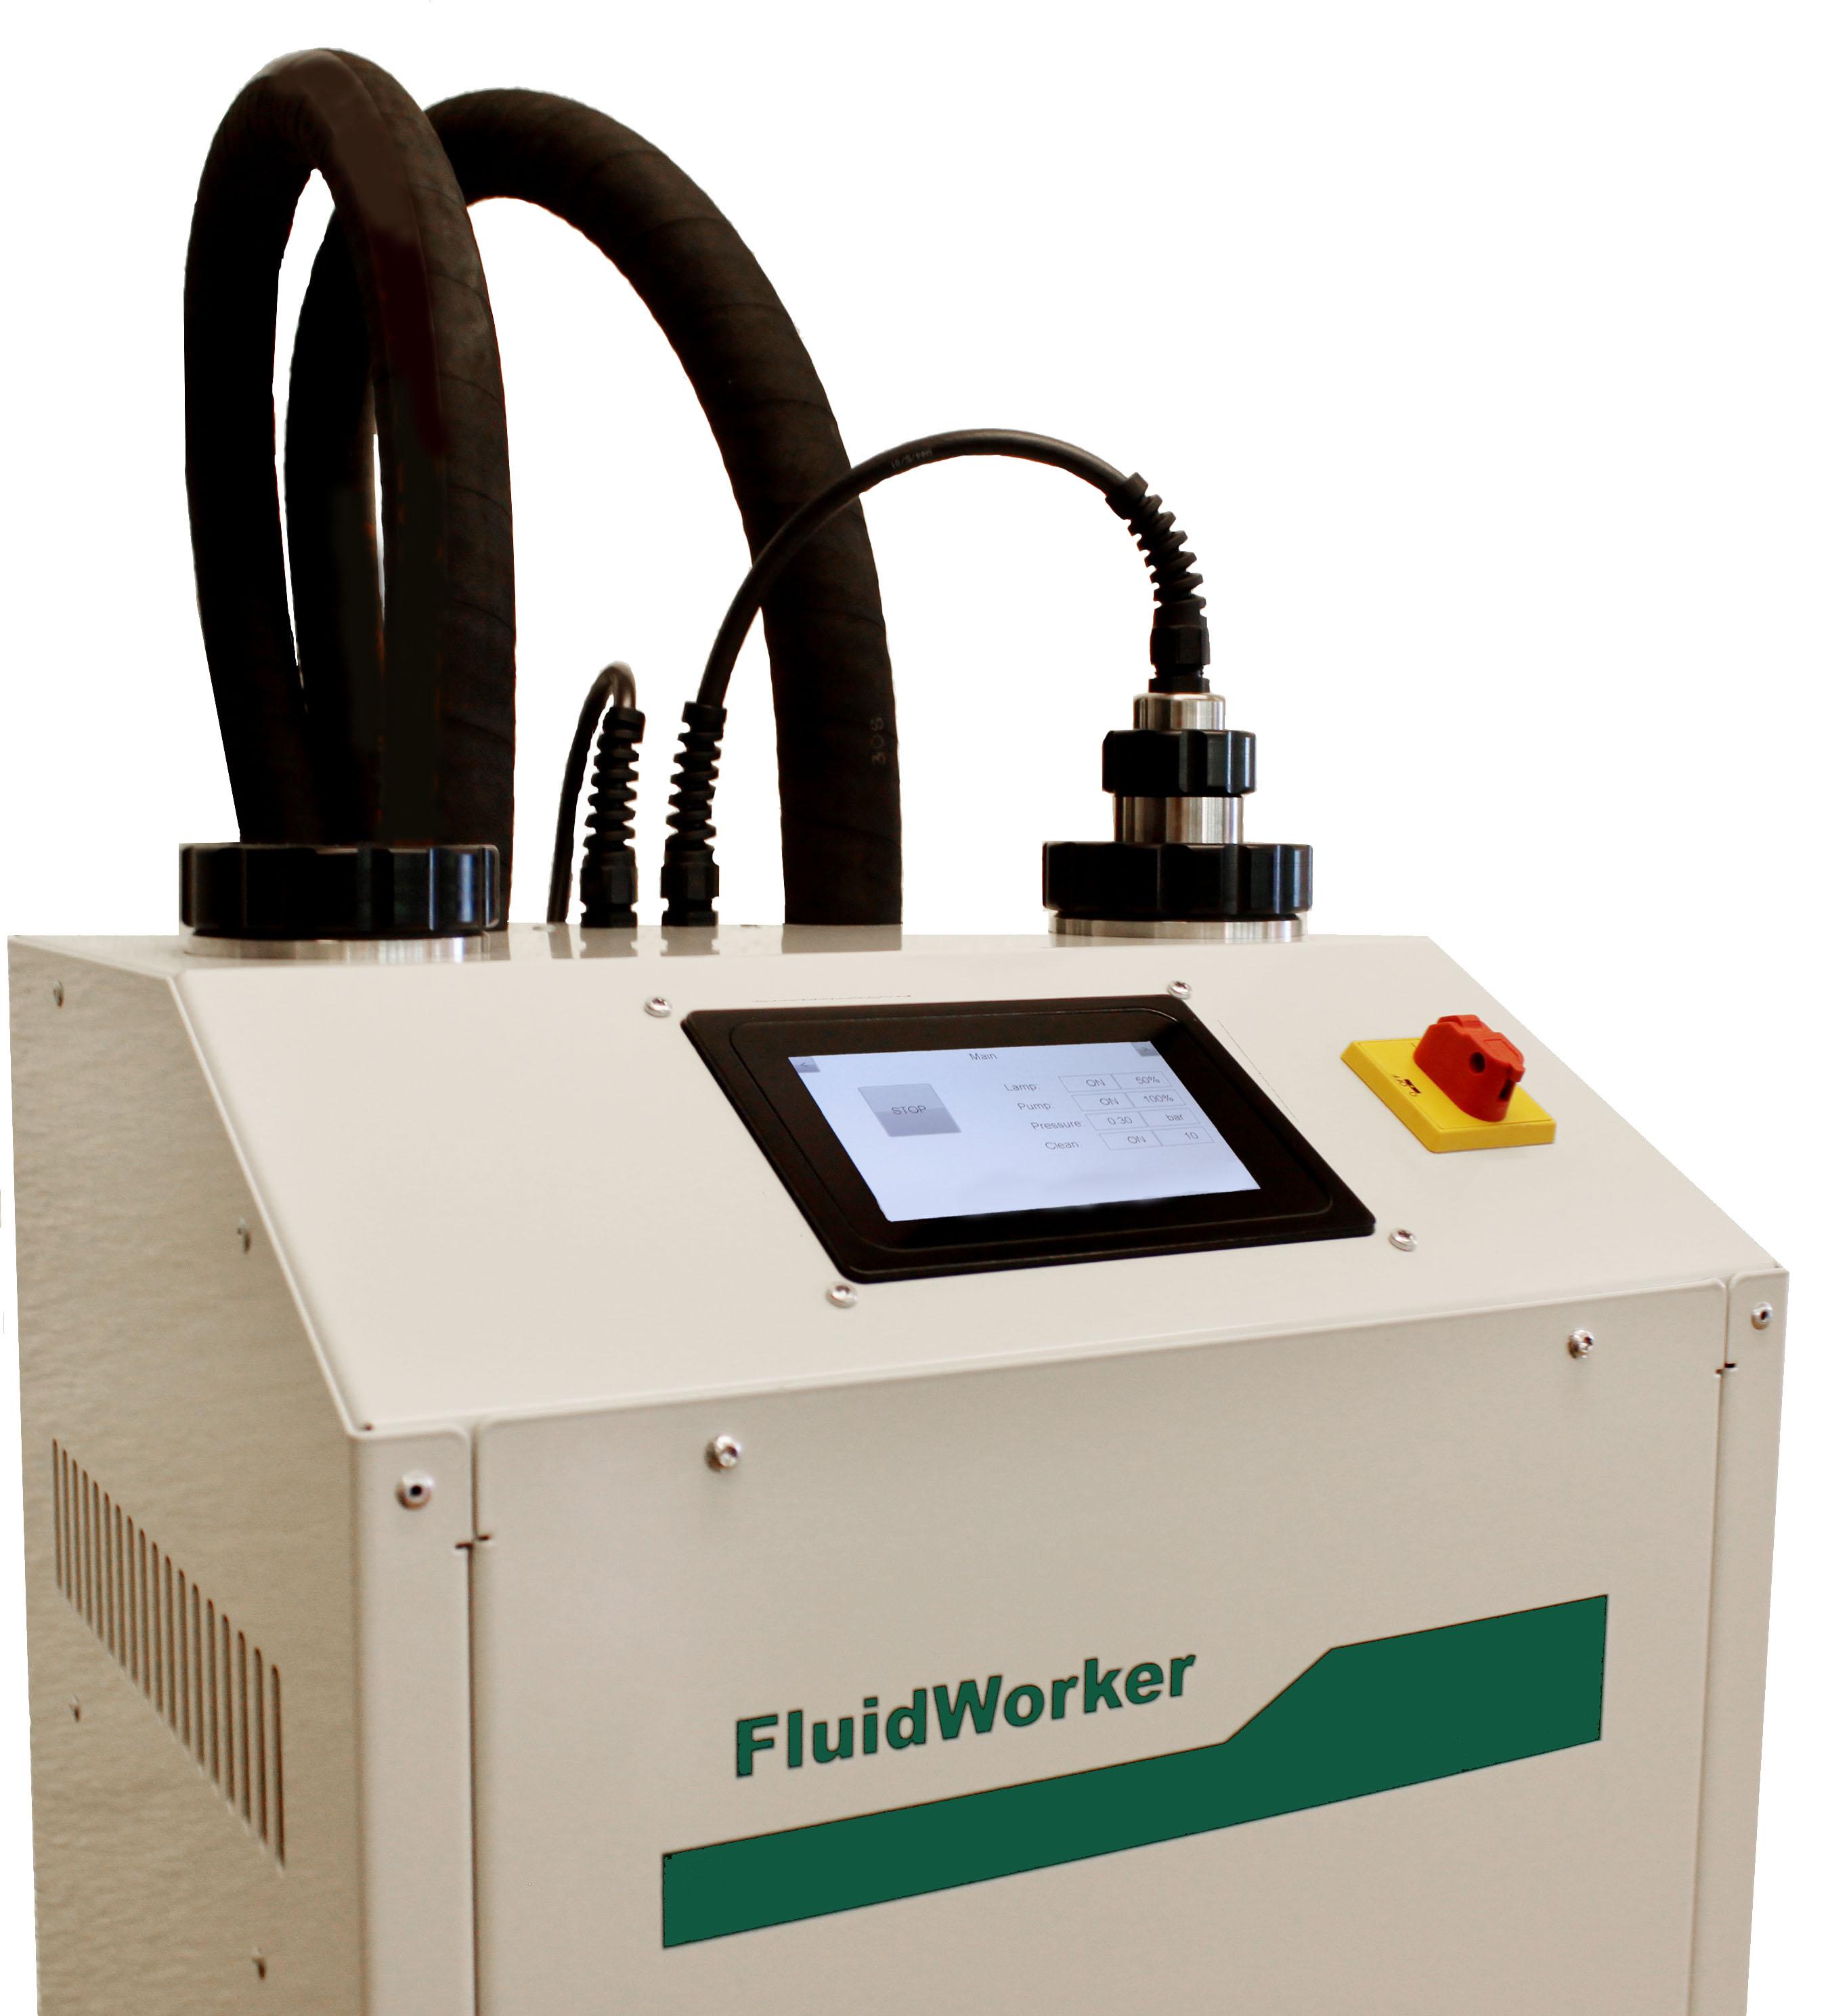 FluidWorker 100